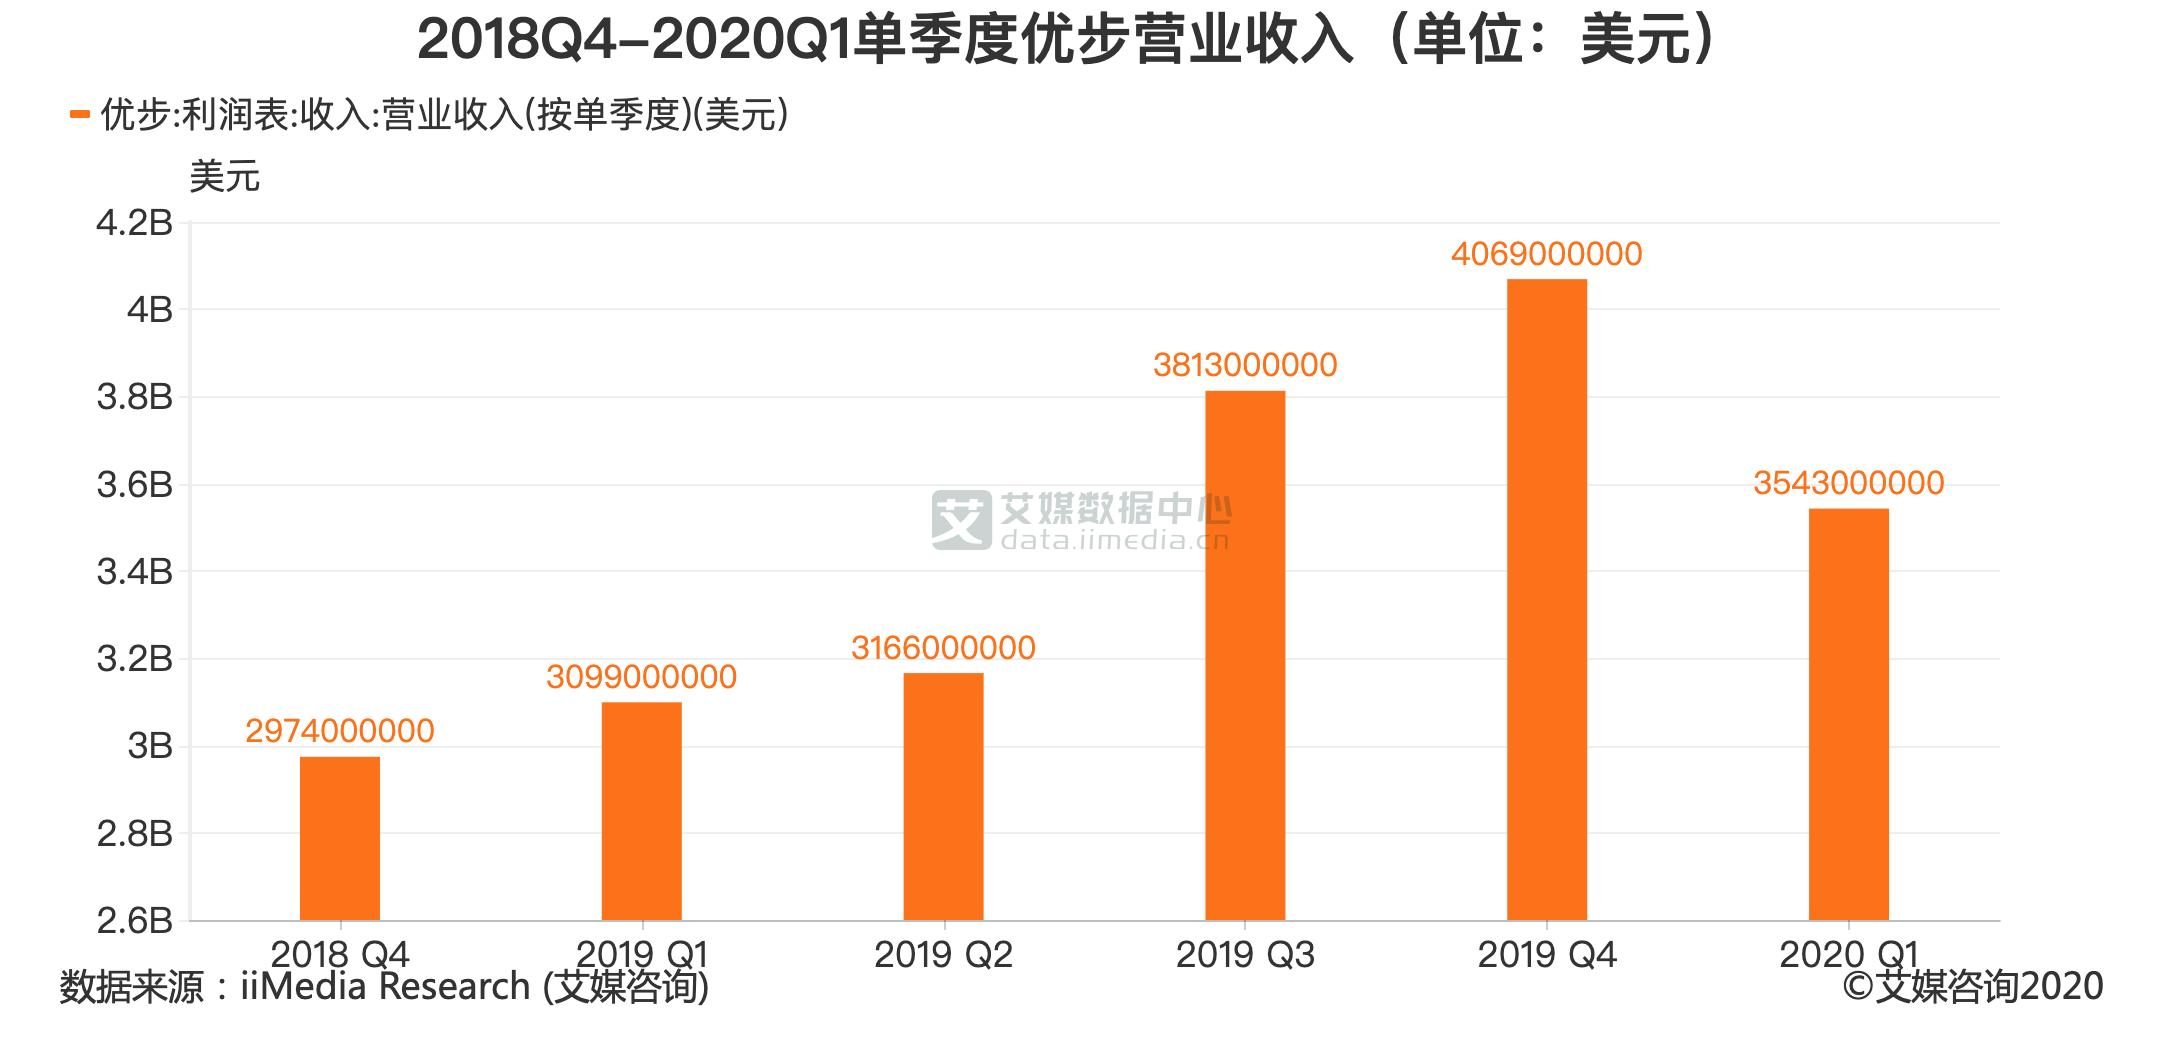 2018Q4-2020Q1单季度优步营业收入(单位:美元)